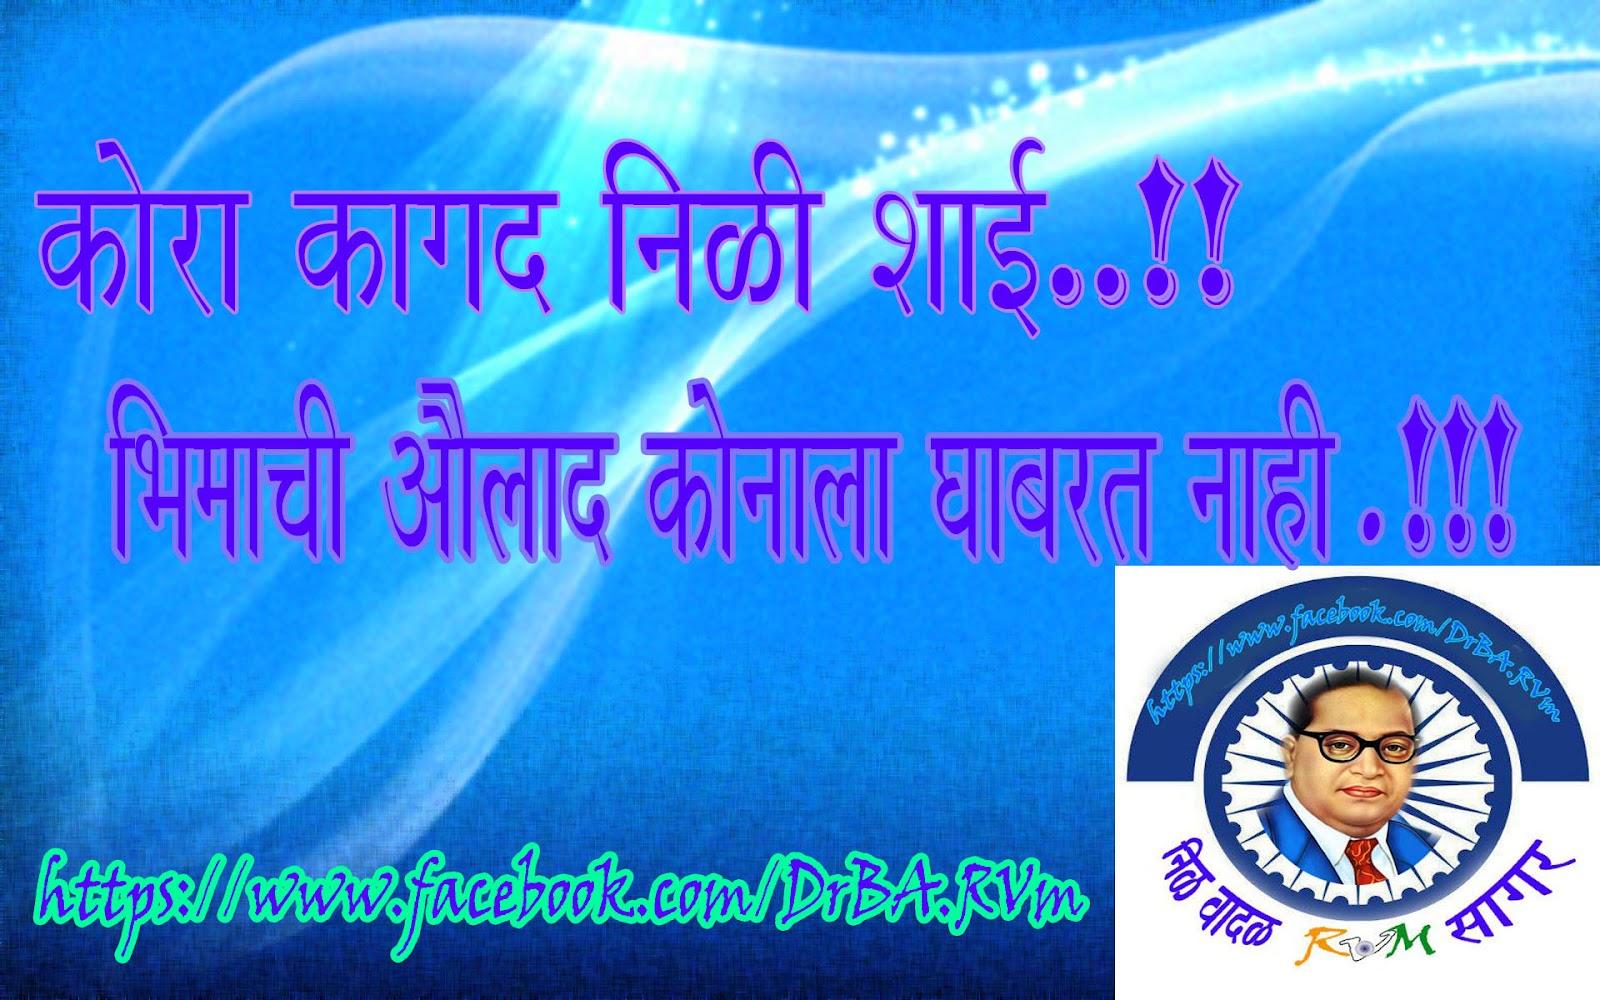 Dr.Babasaheb Ambedkar,jay bhim,nil vadal,sagar,5,B R ambedkar.ambedkar ...